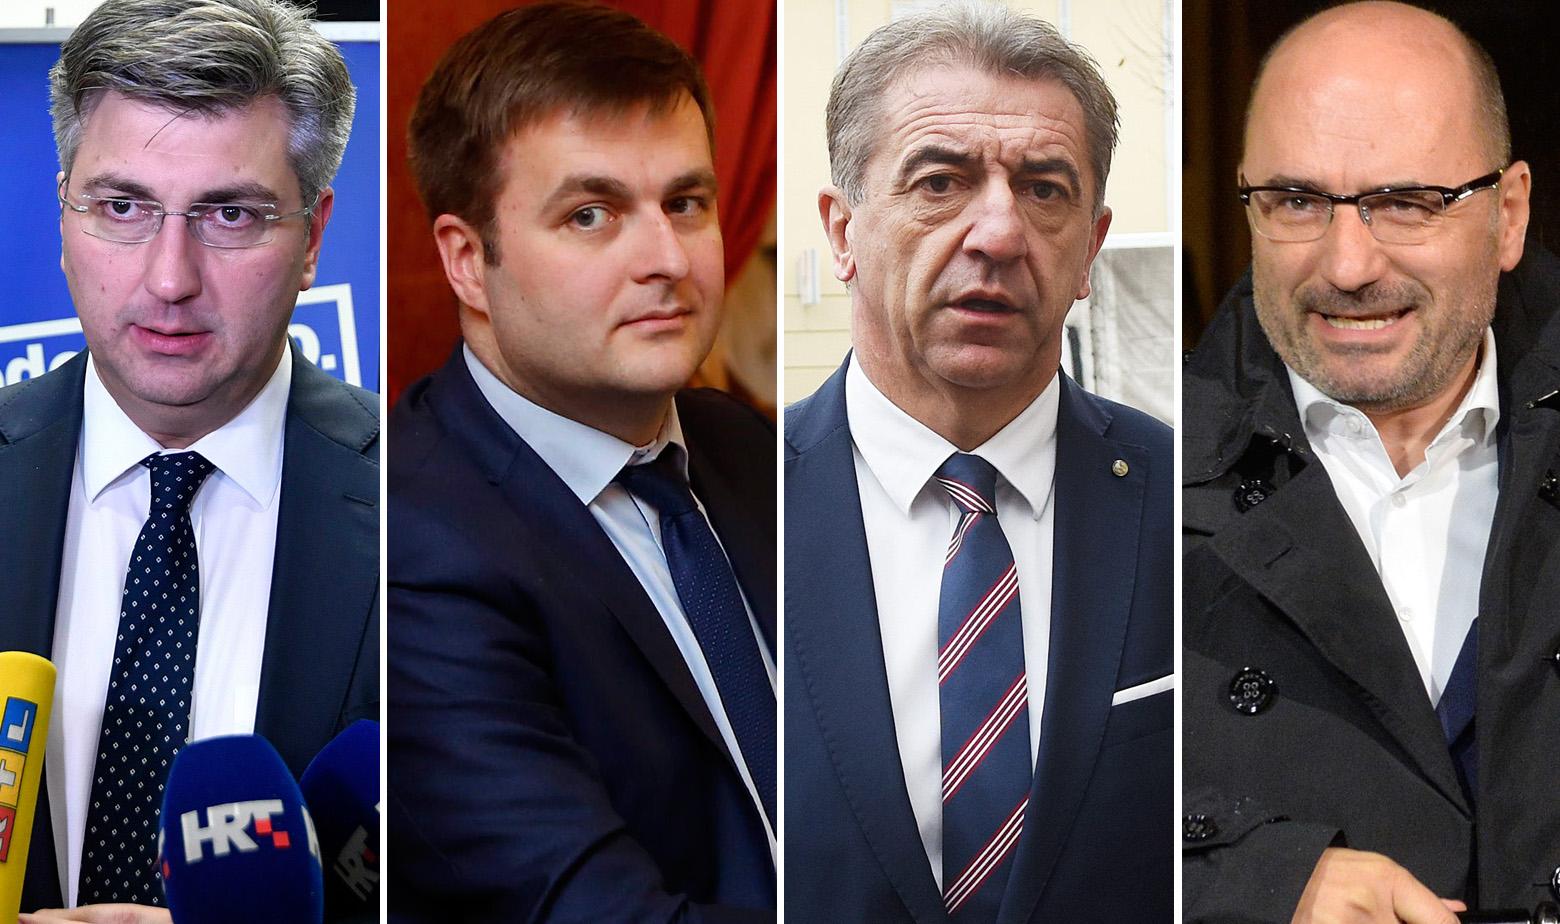 Plenković, Ćorić, Milinović i Brkić